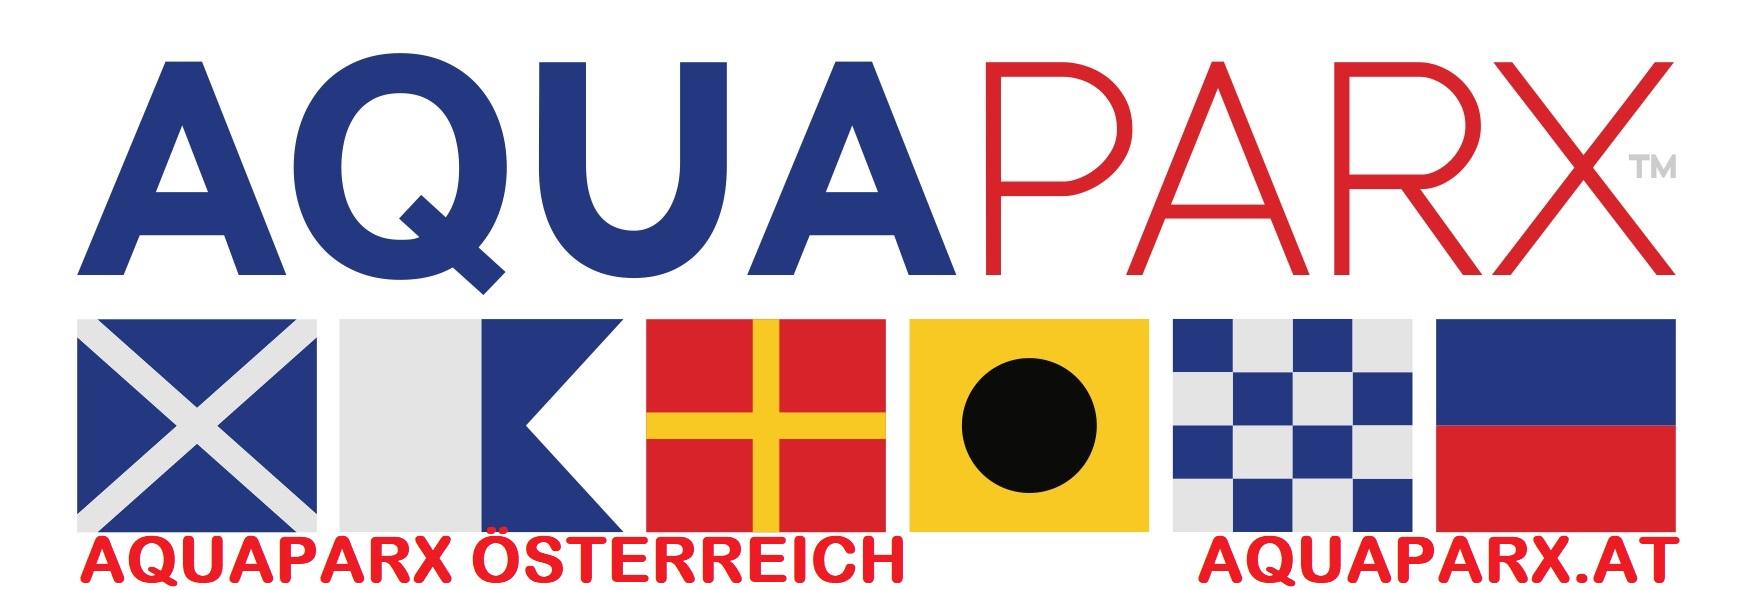 Aquaparx Östereich-Logo